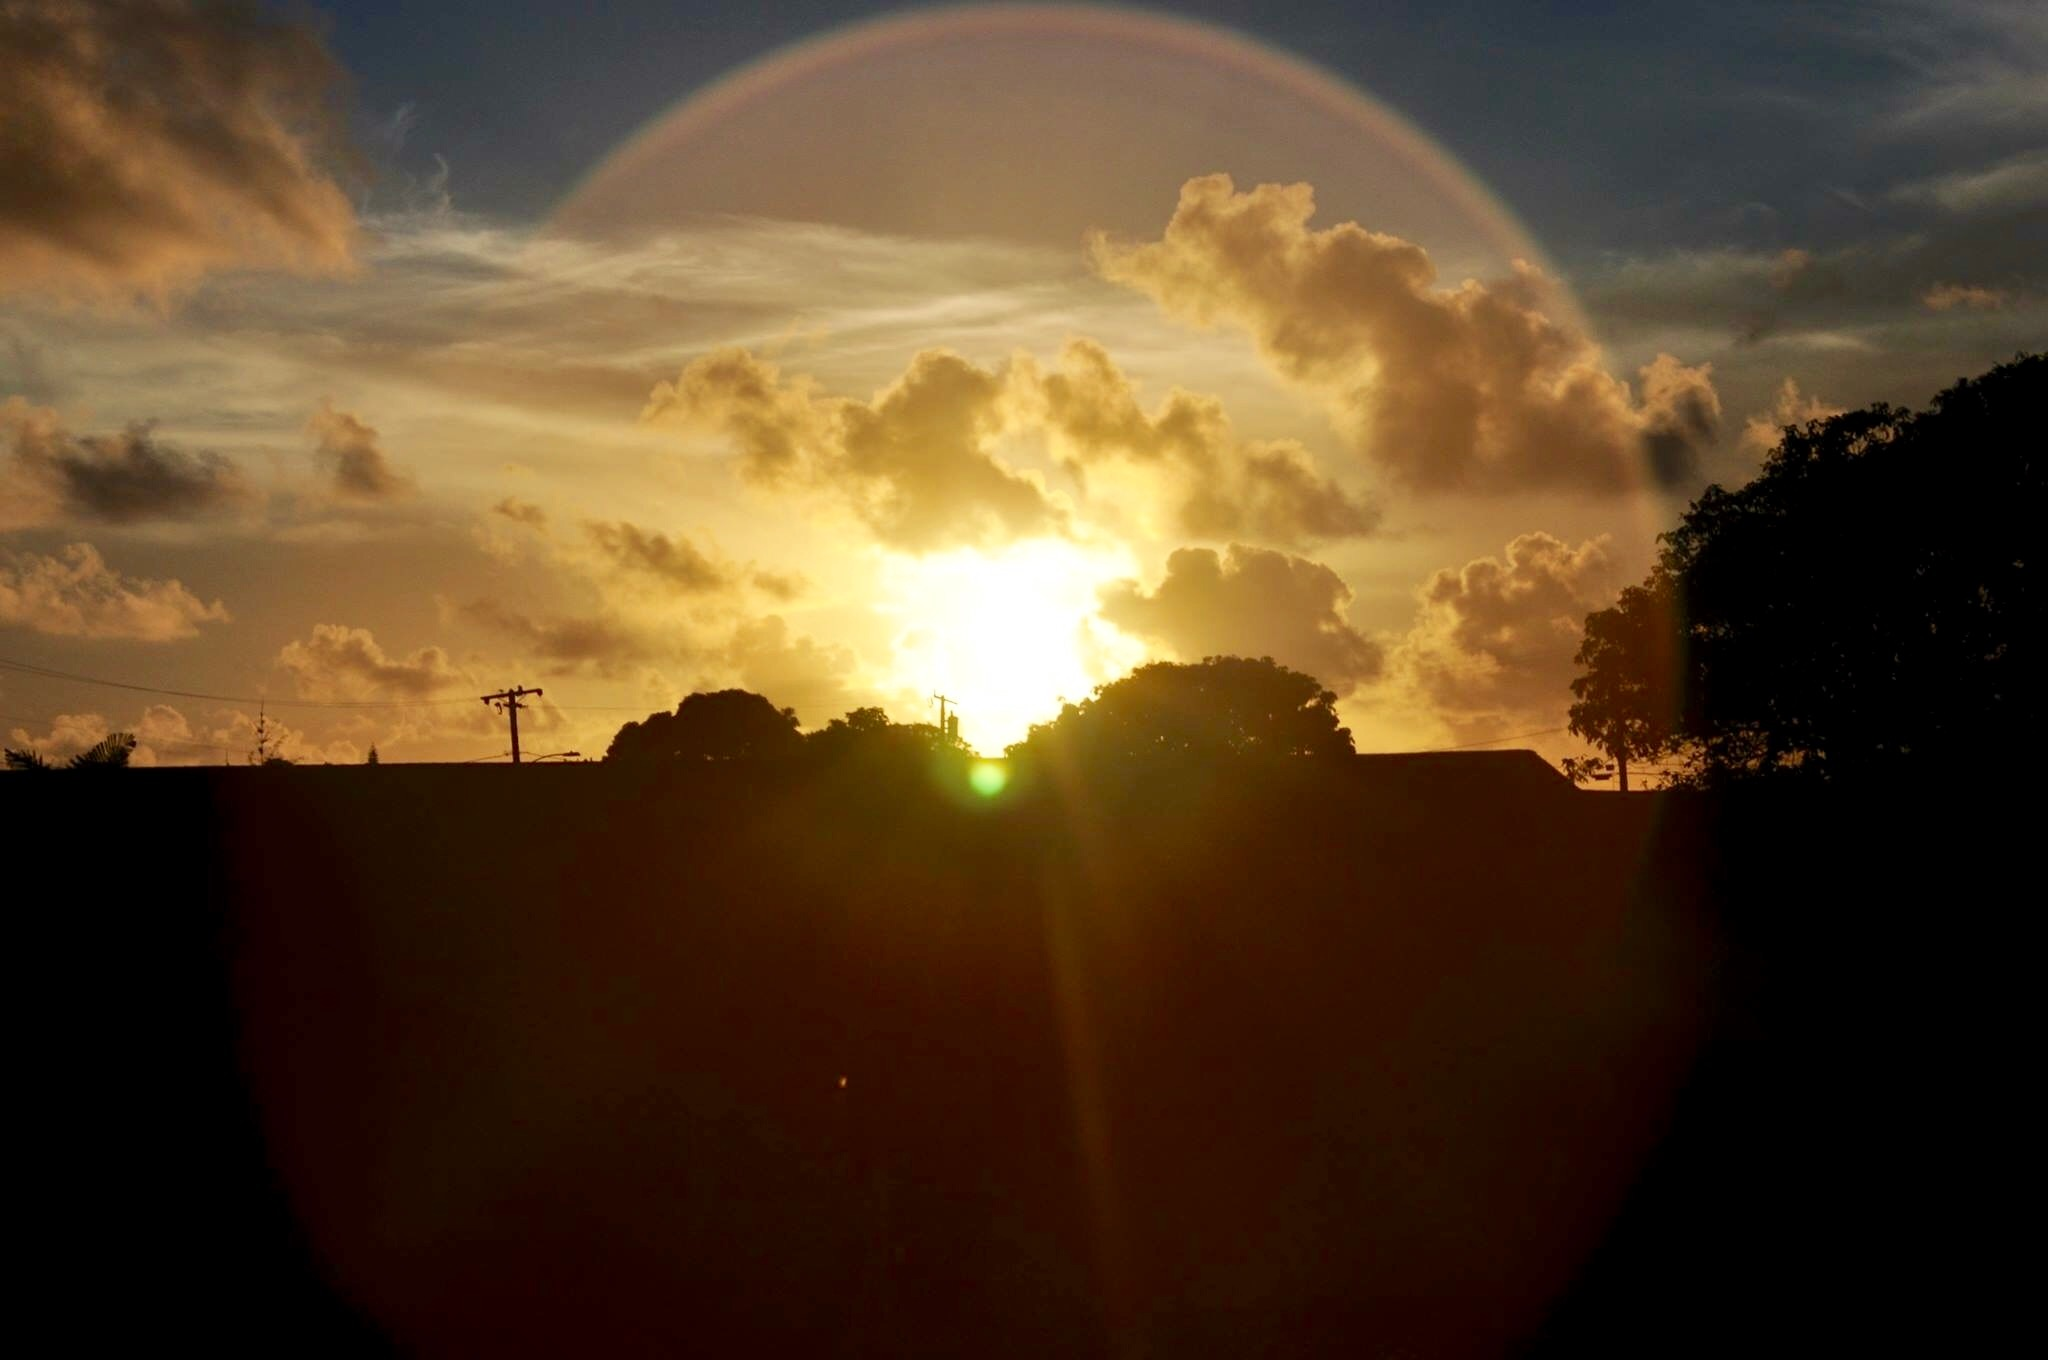 Sunrise by gstyer